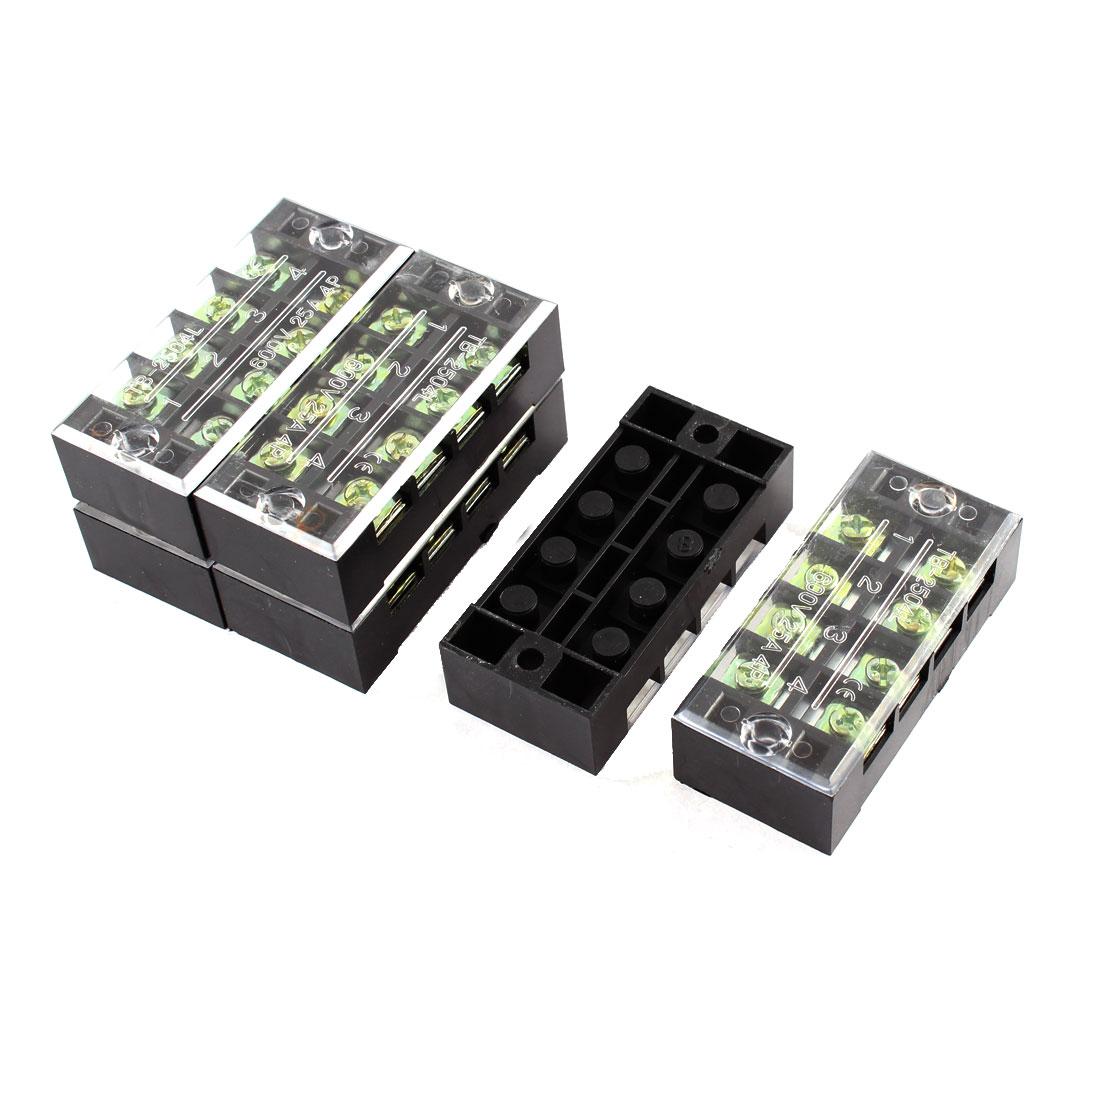 6 Pcs 2504L 600V 25A 4 Positions 8 Screw Electric Barrier Terminal Block